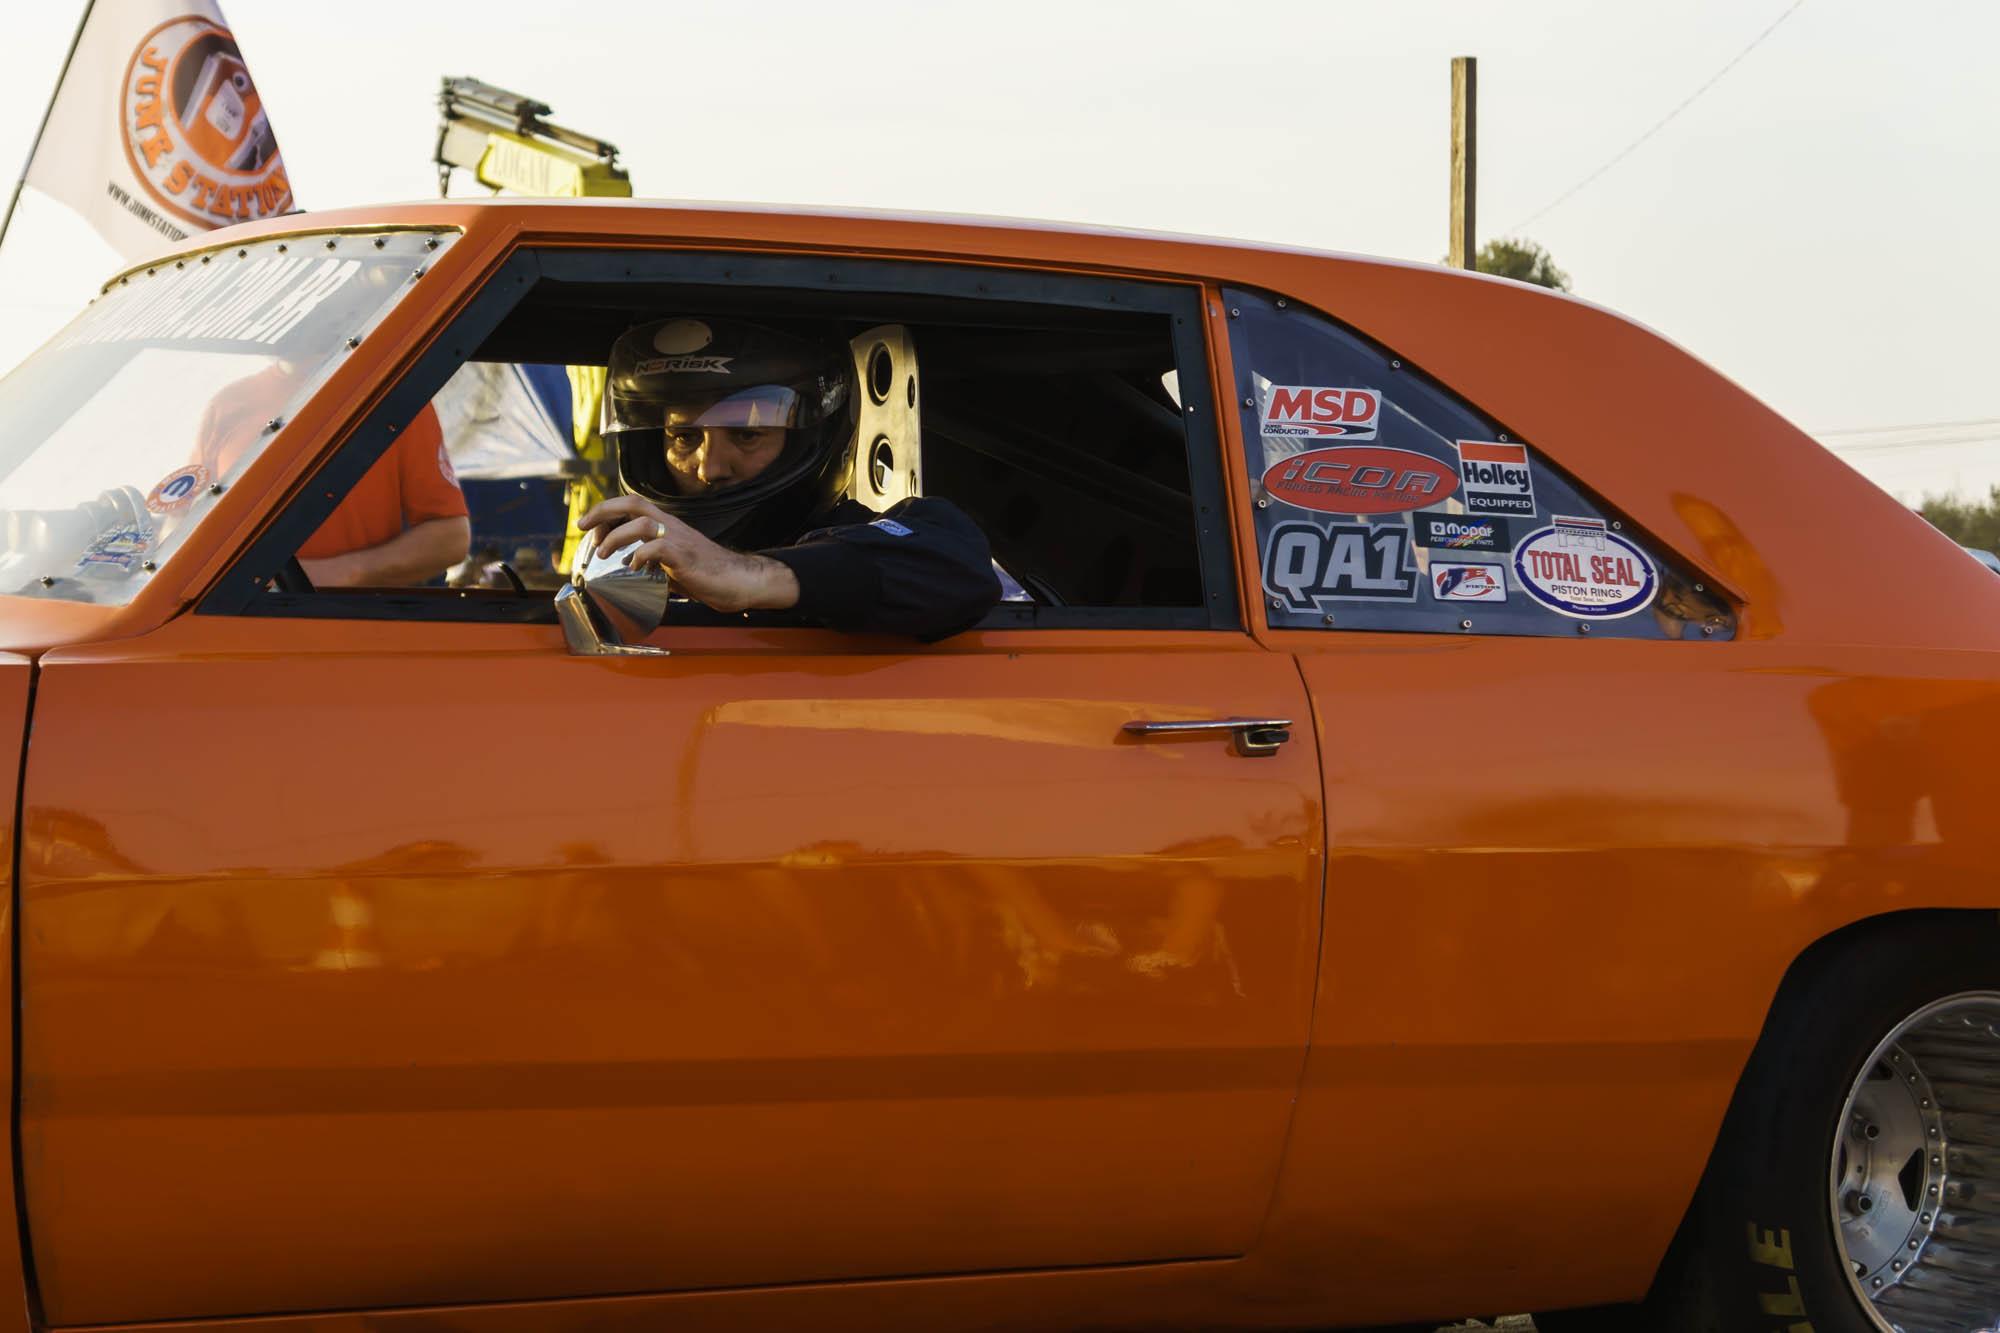 Man in Helmet adjusts Rear Mirror